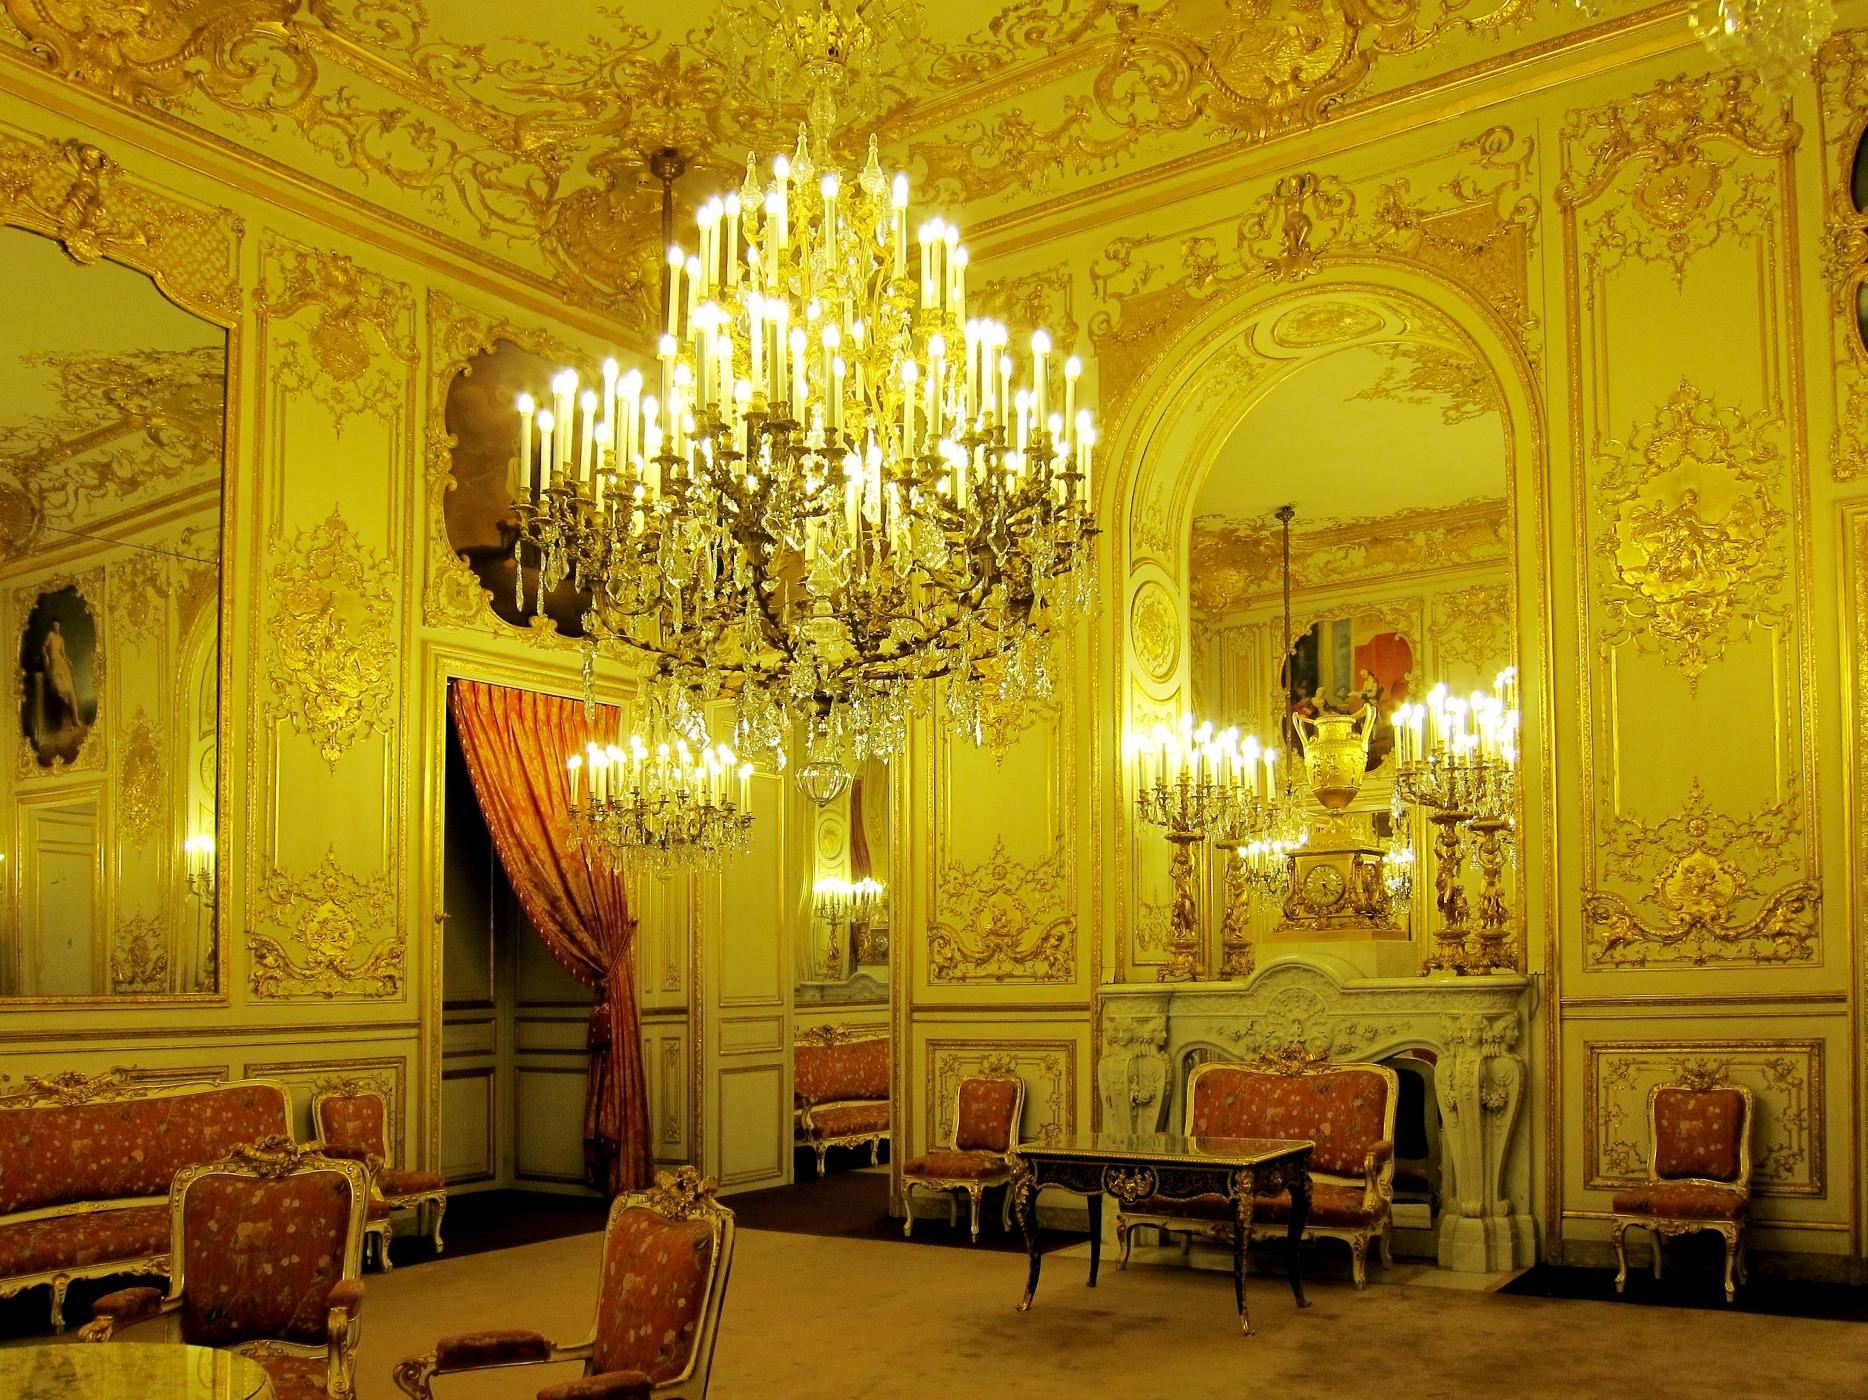 file hotel de lassay bureau jpg wikimedia commons. Black Bedroom Furniture Sets. Home Design Ideas